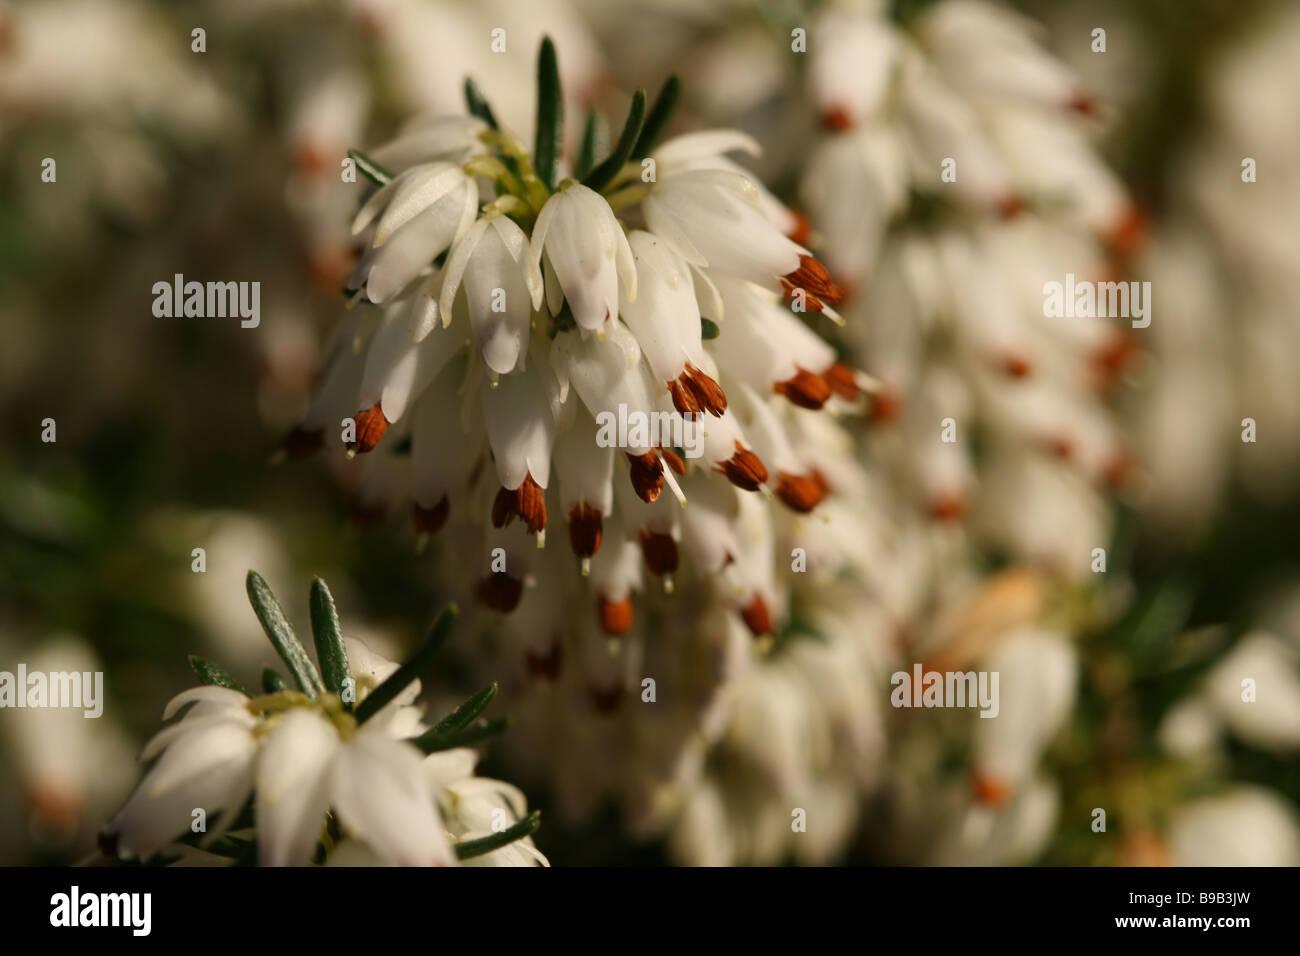 White heather flower detail stock photo 22986625 alamy white heather flower detail mightylinksfo